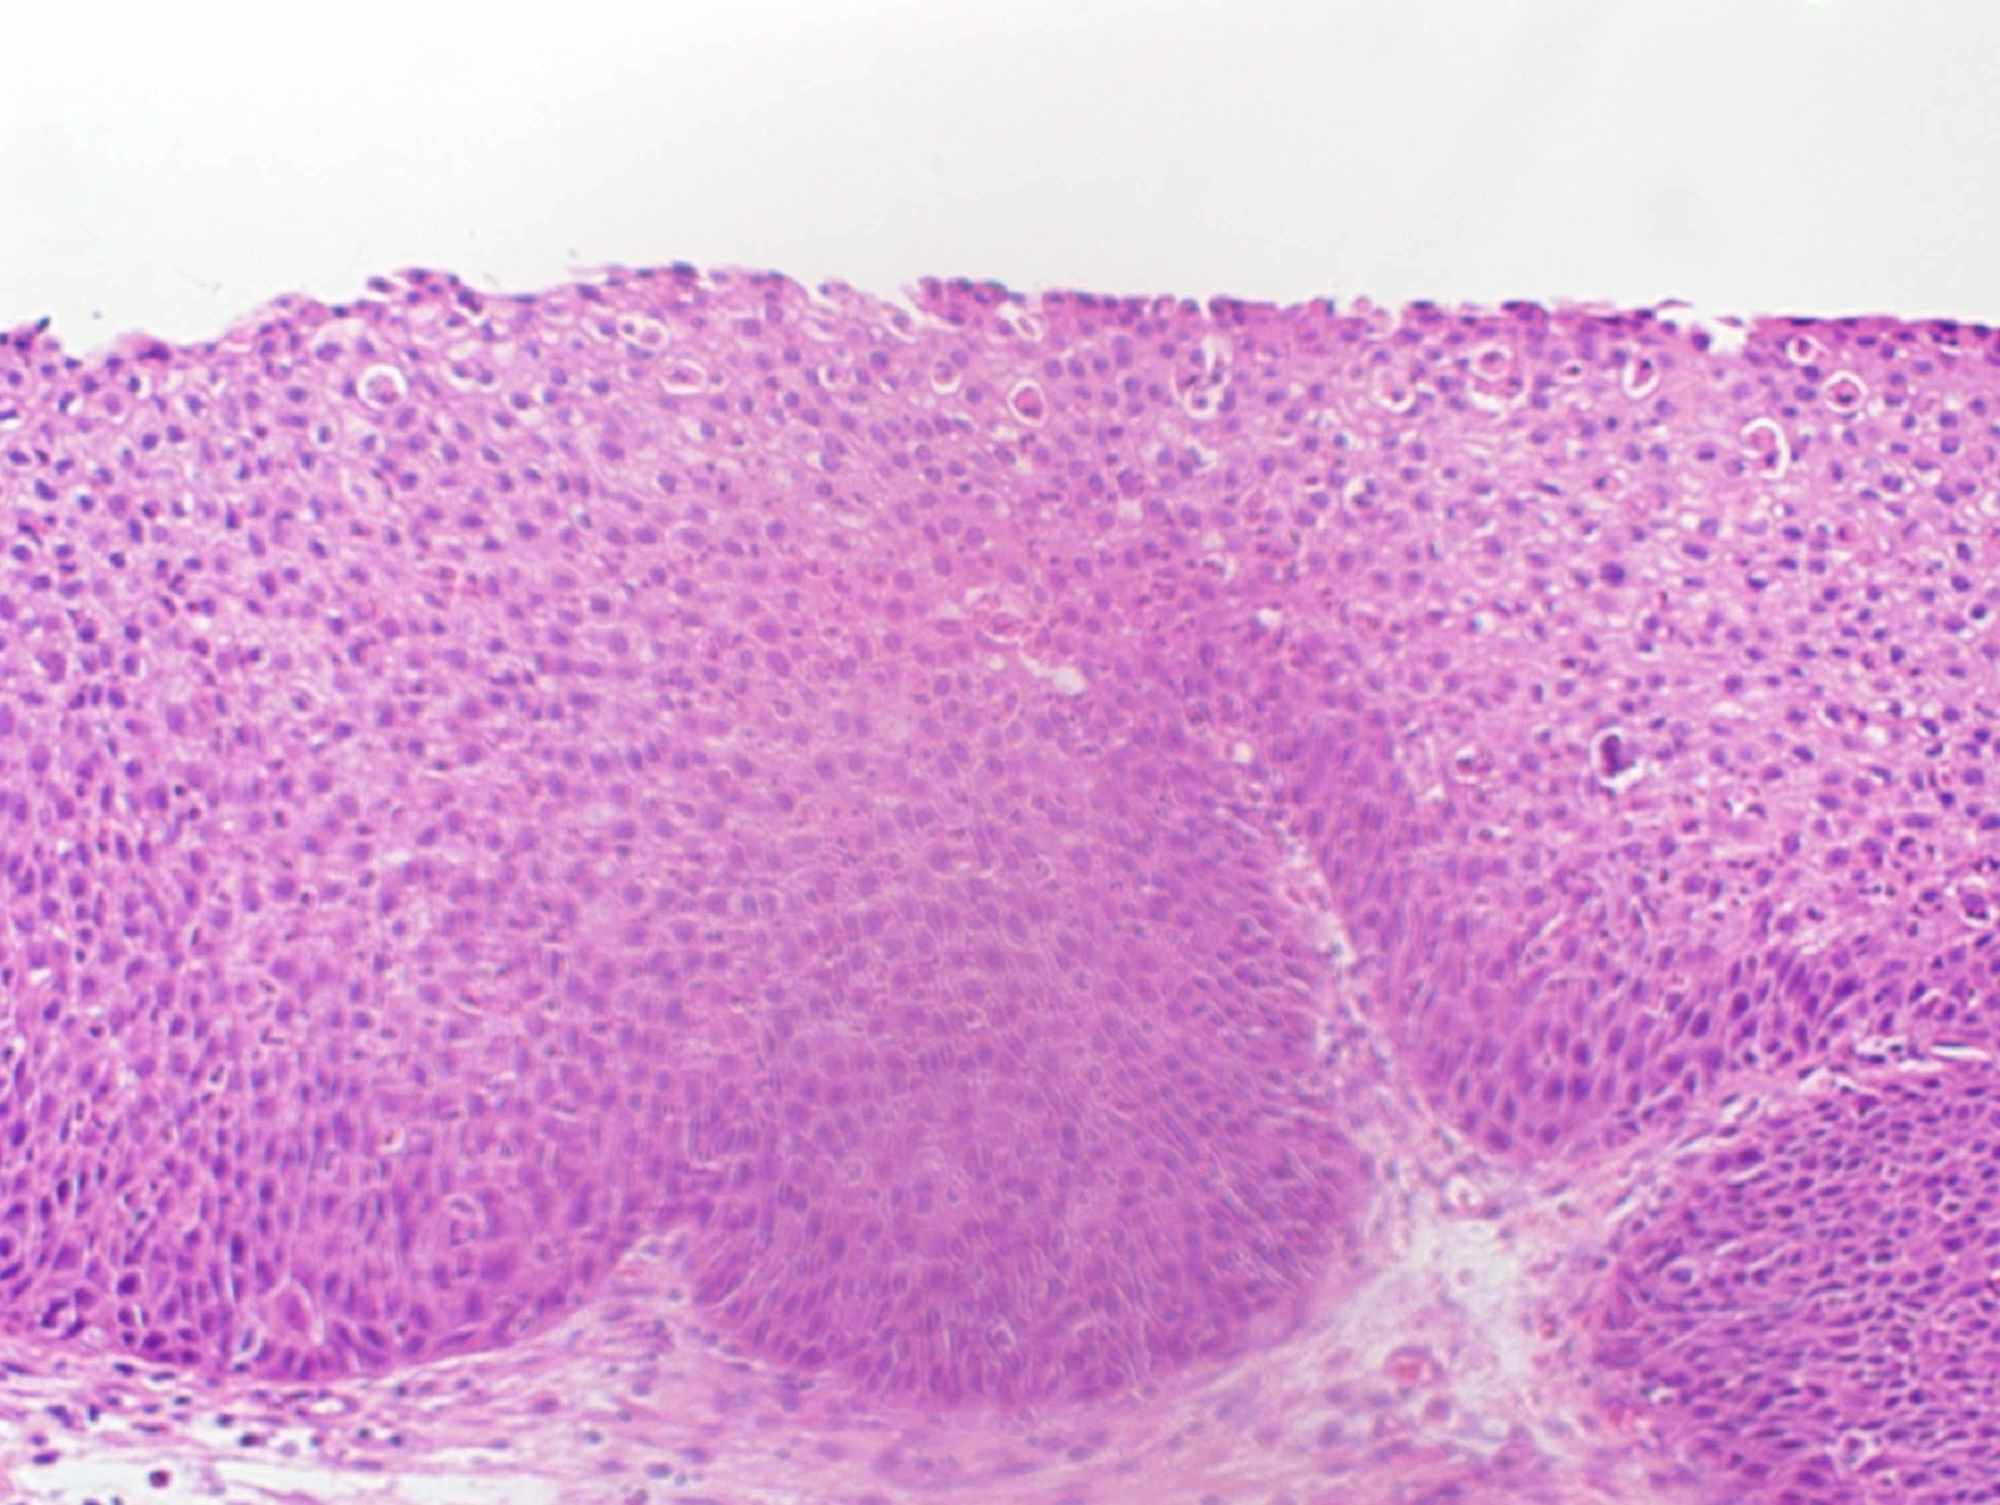 breast cancer hormonal stimulation viermi intestinali giardia